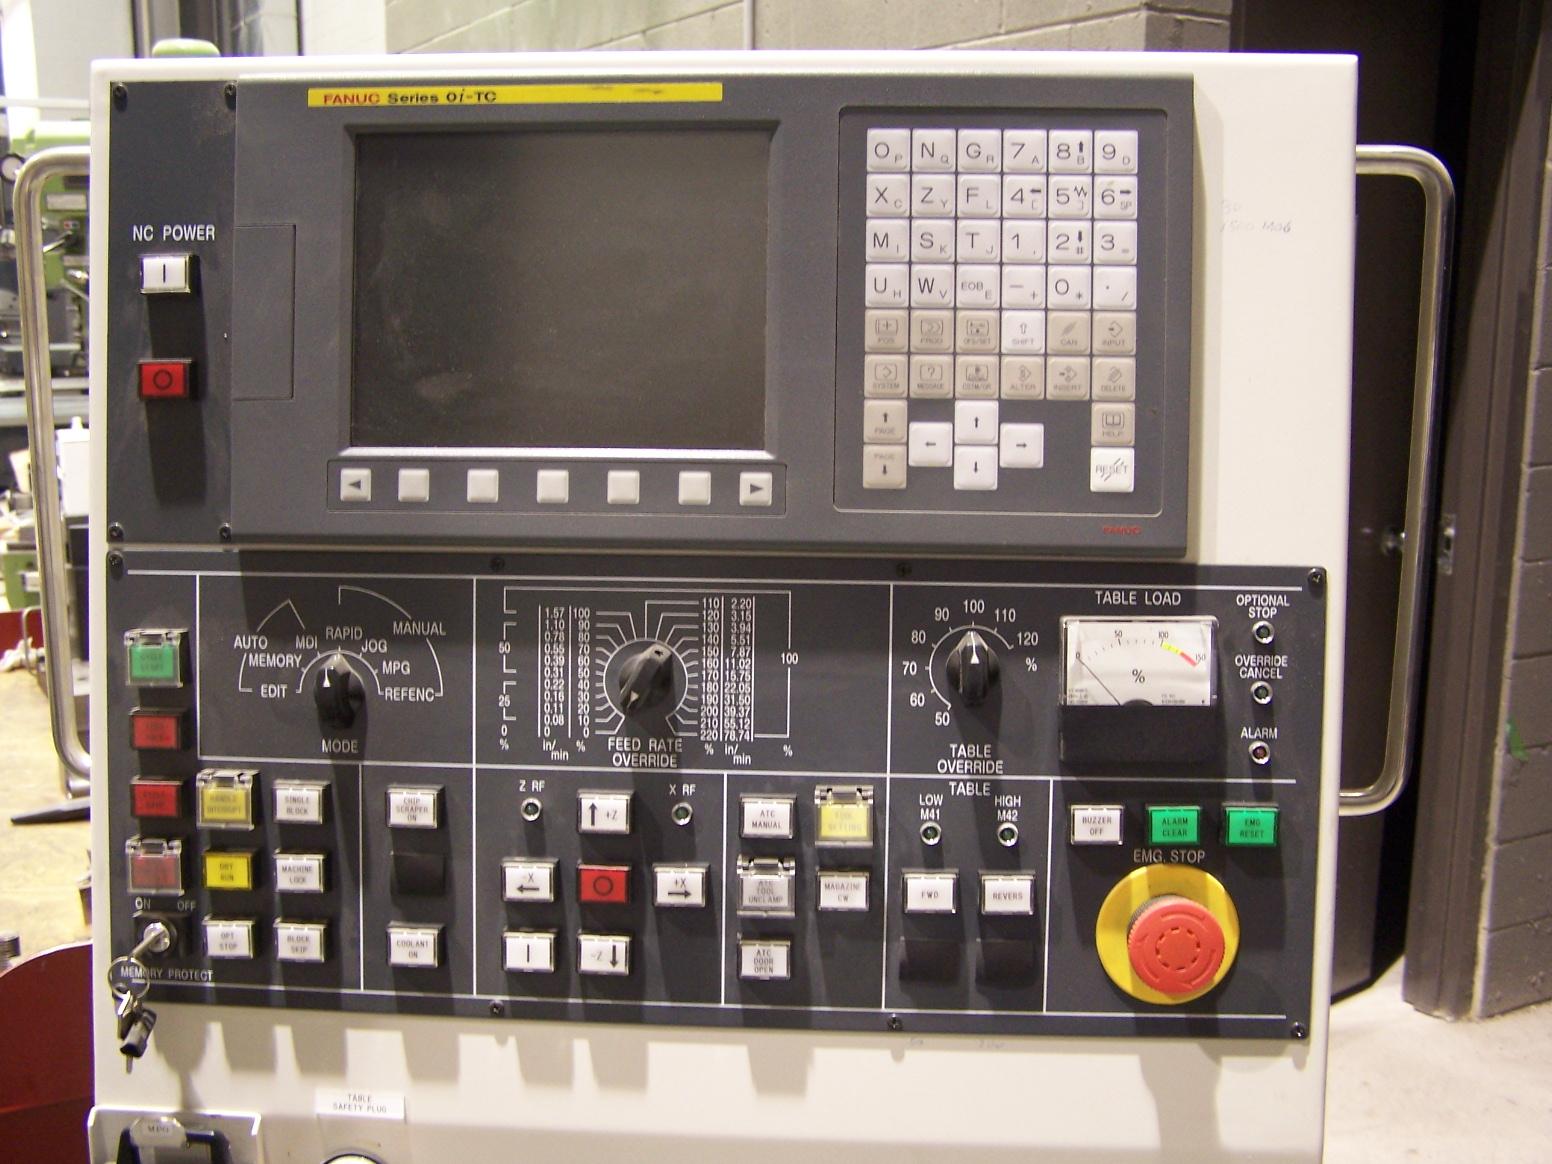 "Toshiba90"" SWING, FANUC Oi-TC CNC Control, Elevating Cross rail, Chip Conveyor, High Guards, Under 200 Hours!"